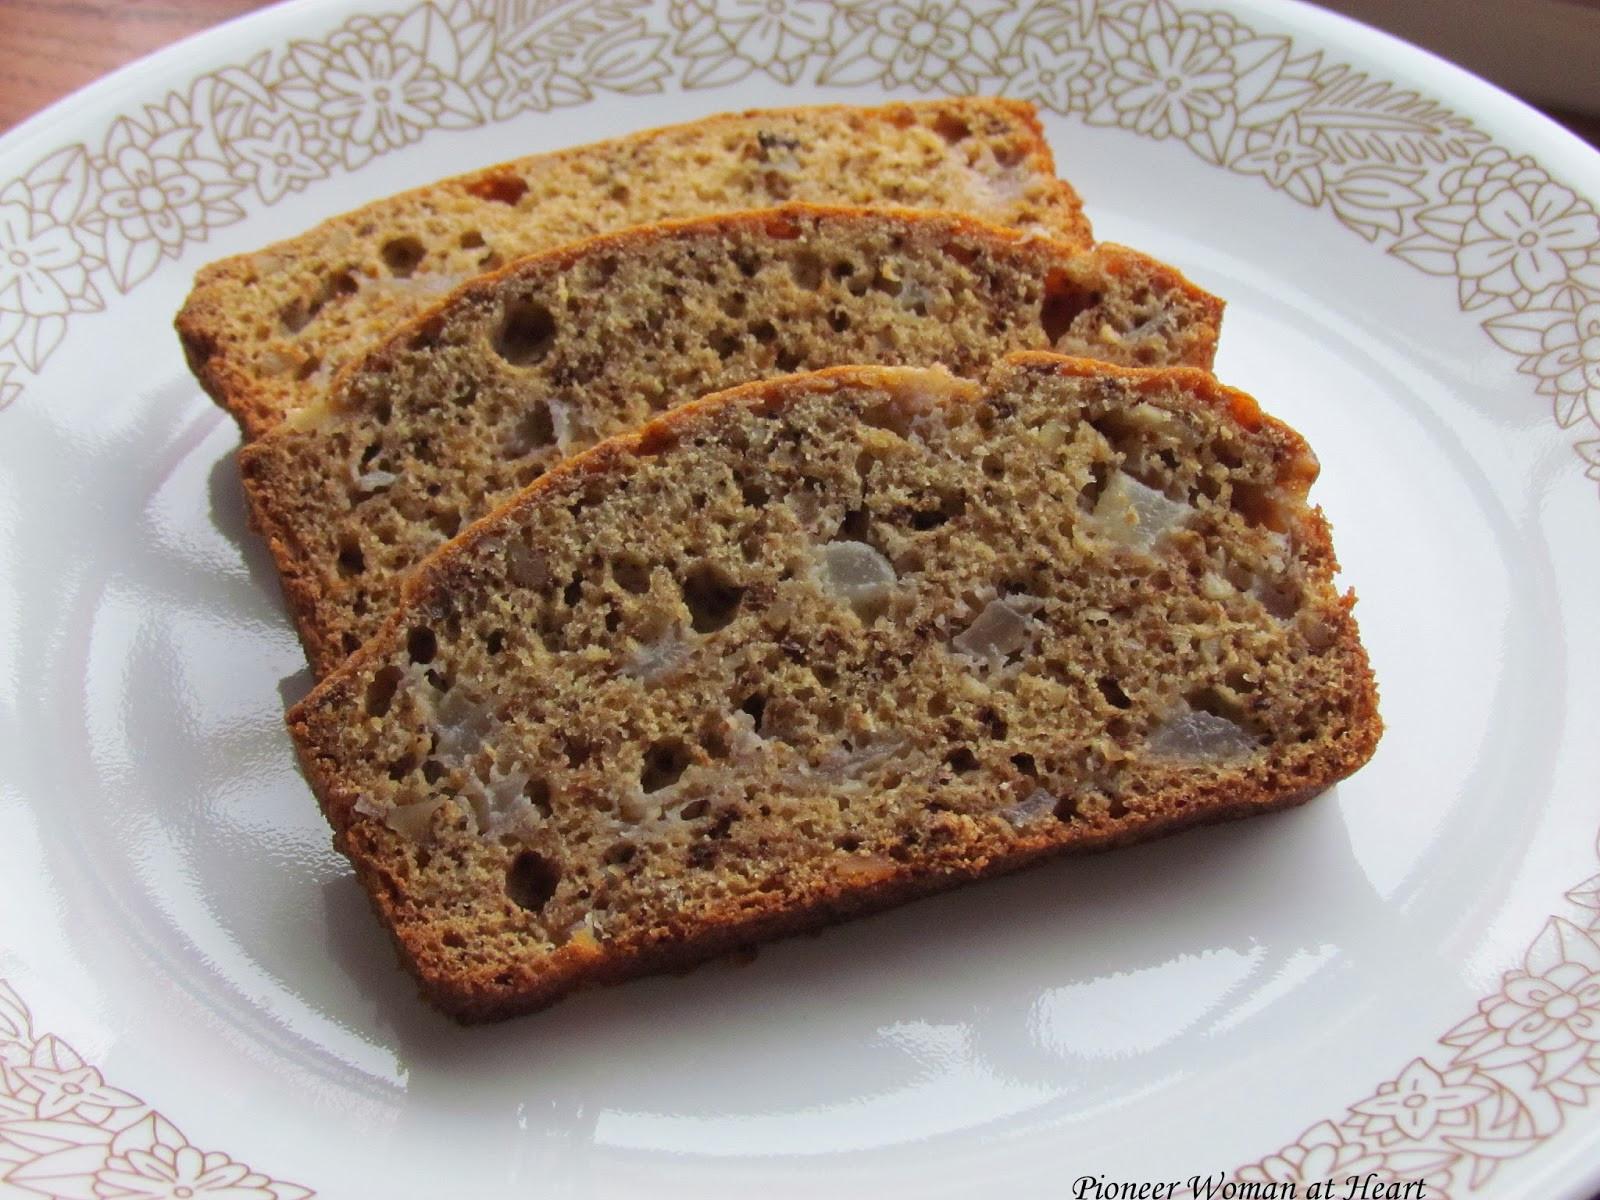 Pioneer Woman Banana Bread  Pioneer Woman Recipes Bread Bing images